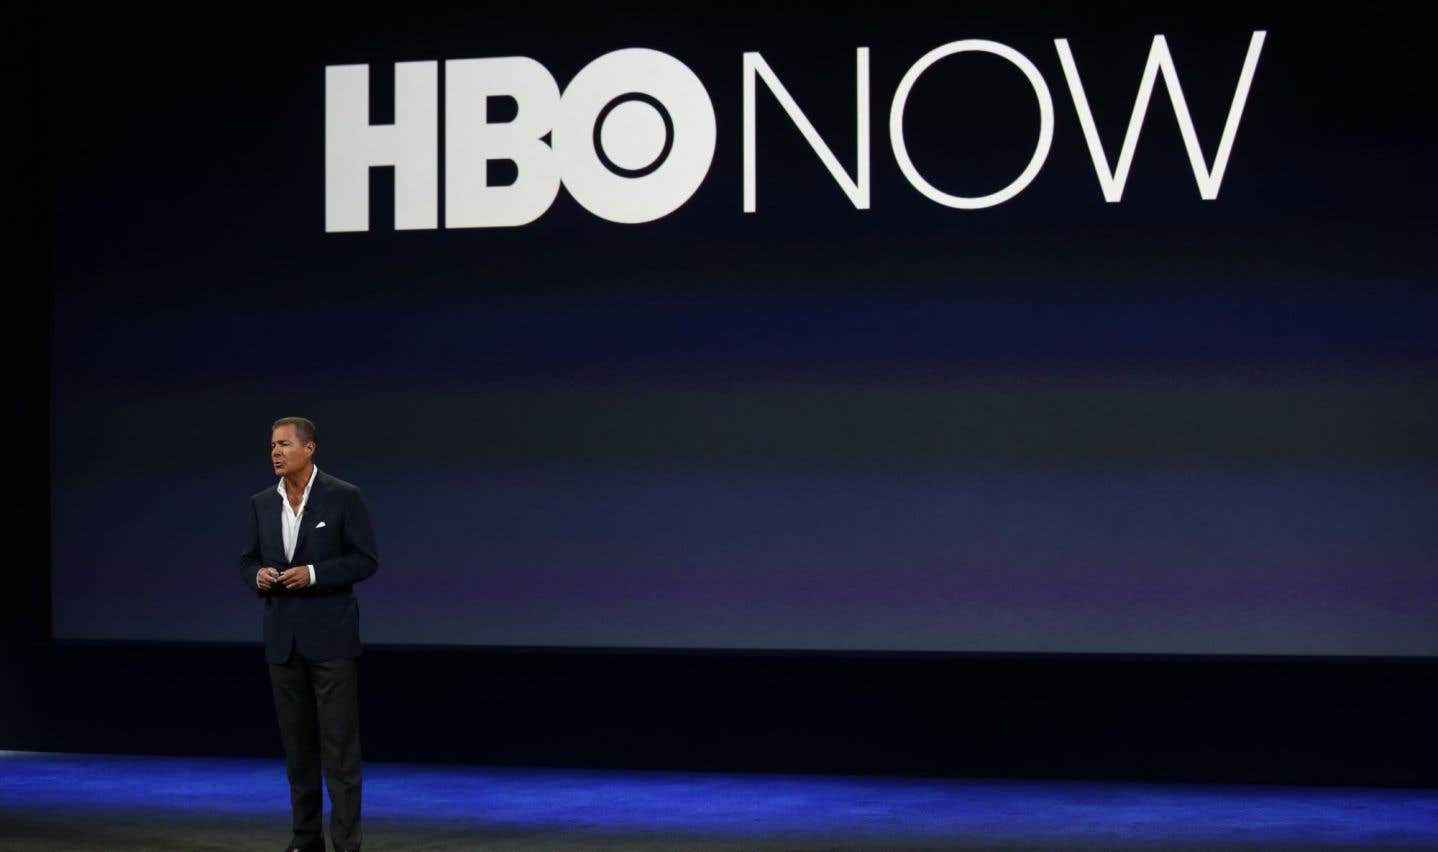 Le patron de la chaîne HBO, Richard Plepler